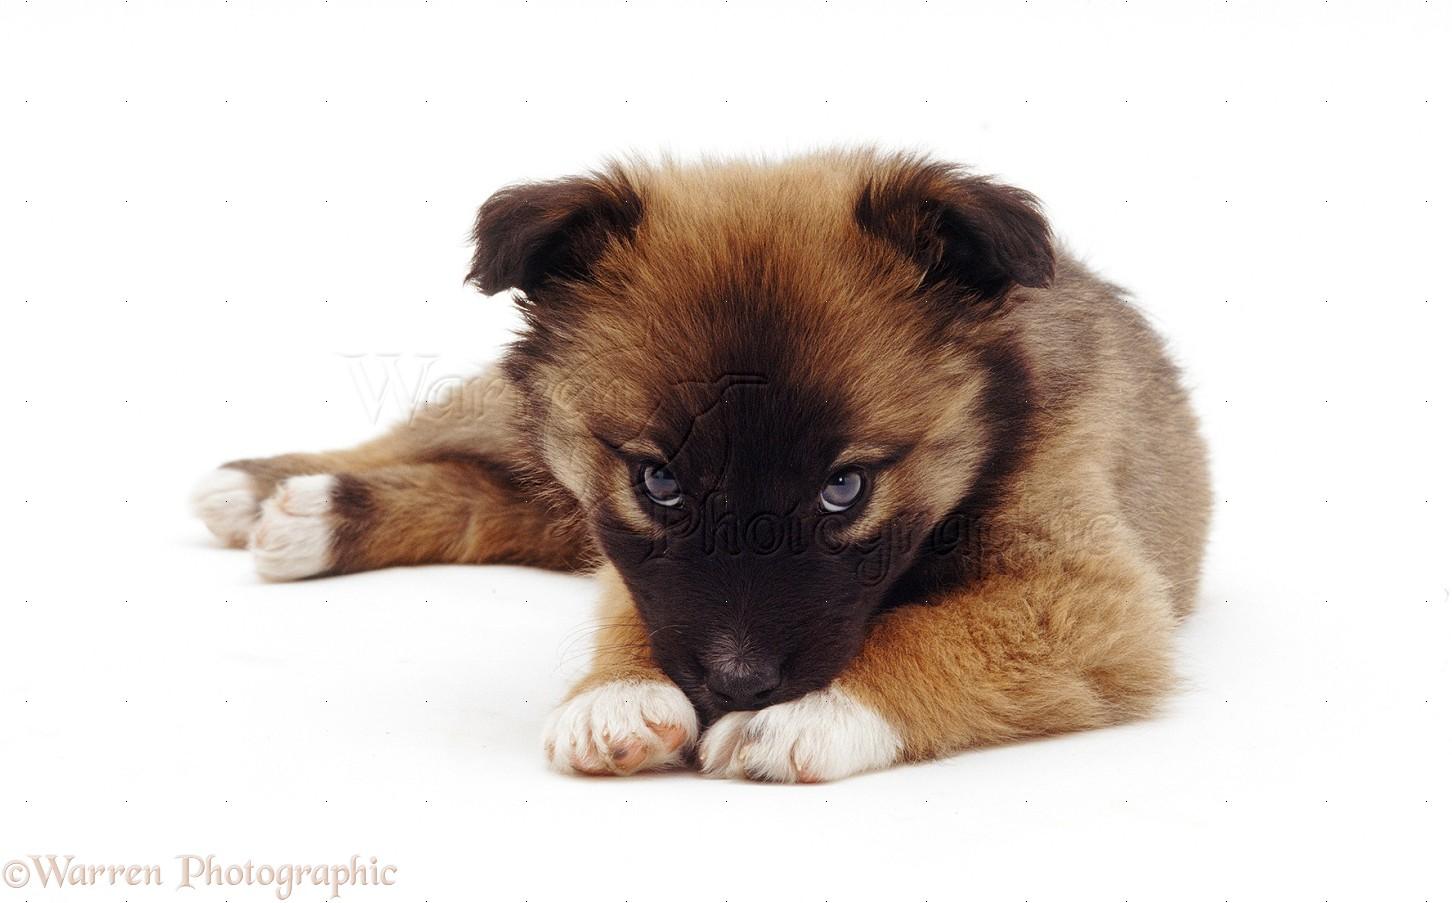 Dog: Cute mongrel pup, with chin on paws photo WP18679 Дворняжка Щенок